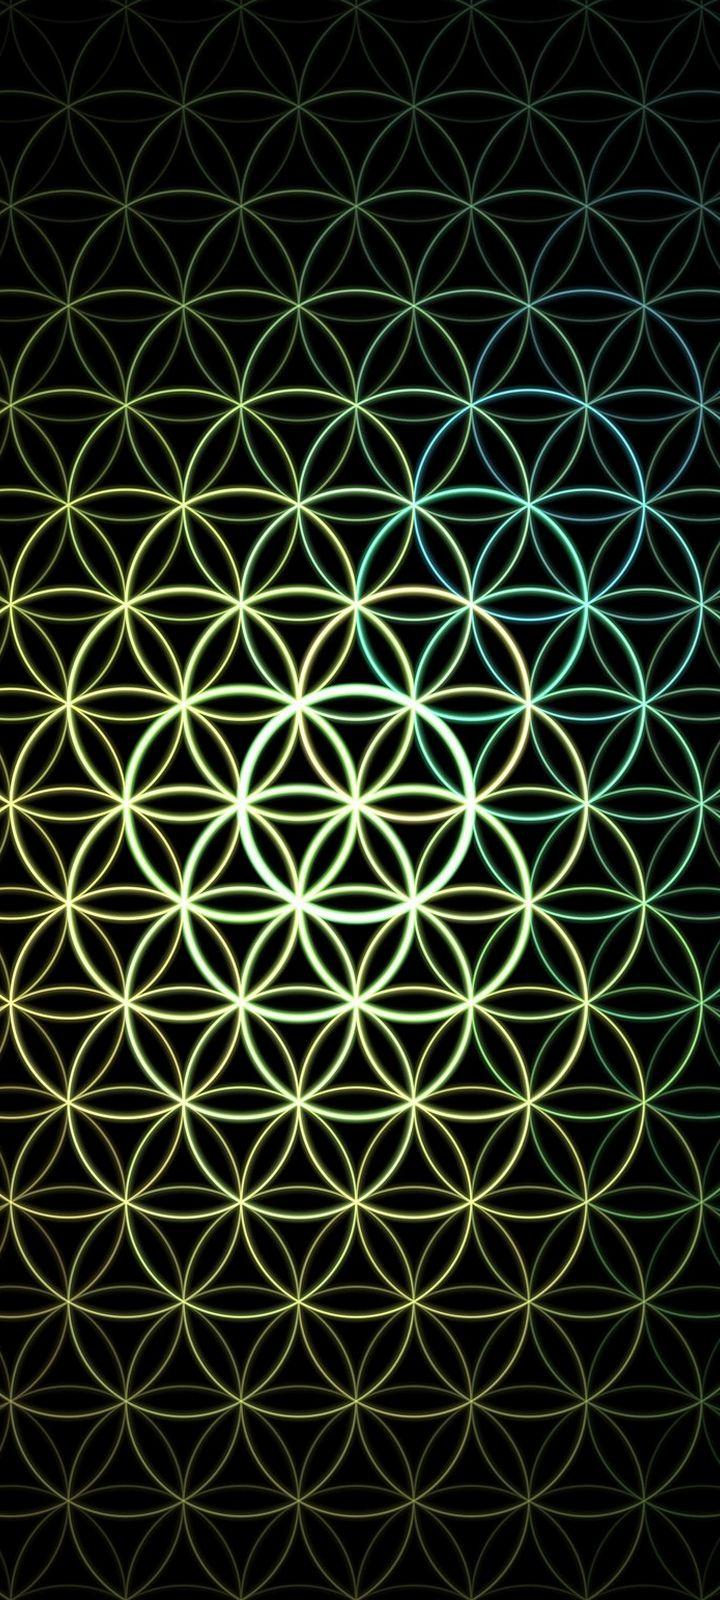 Pattern Circles Mesh Wallpaper 720x1600